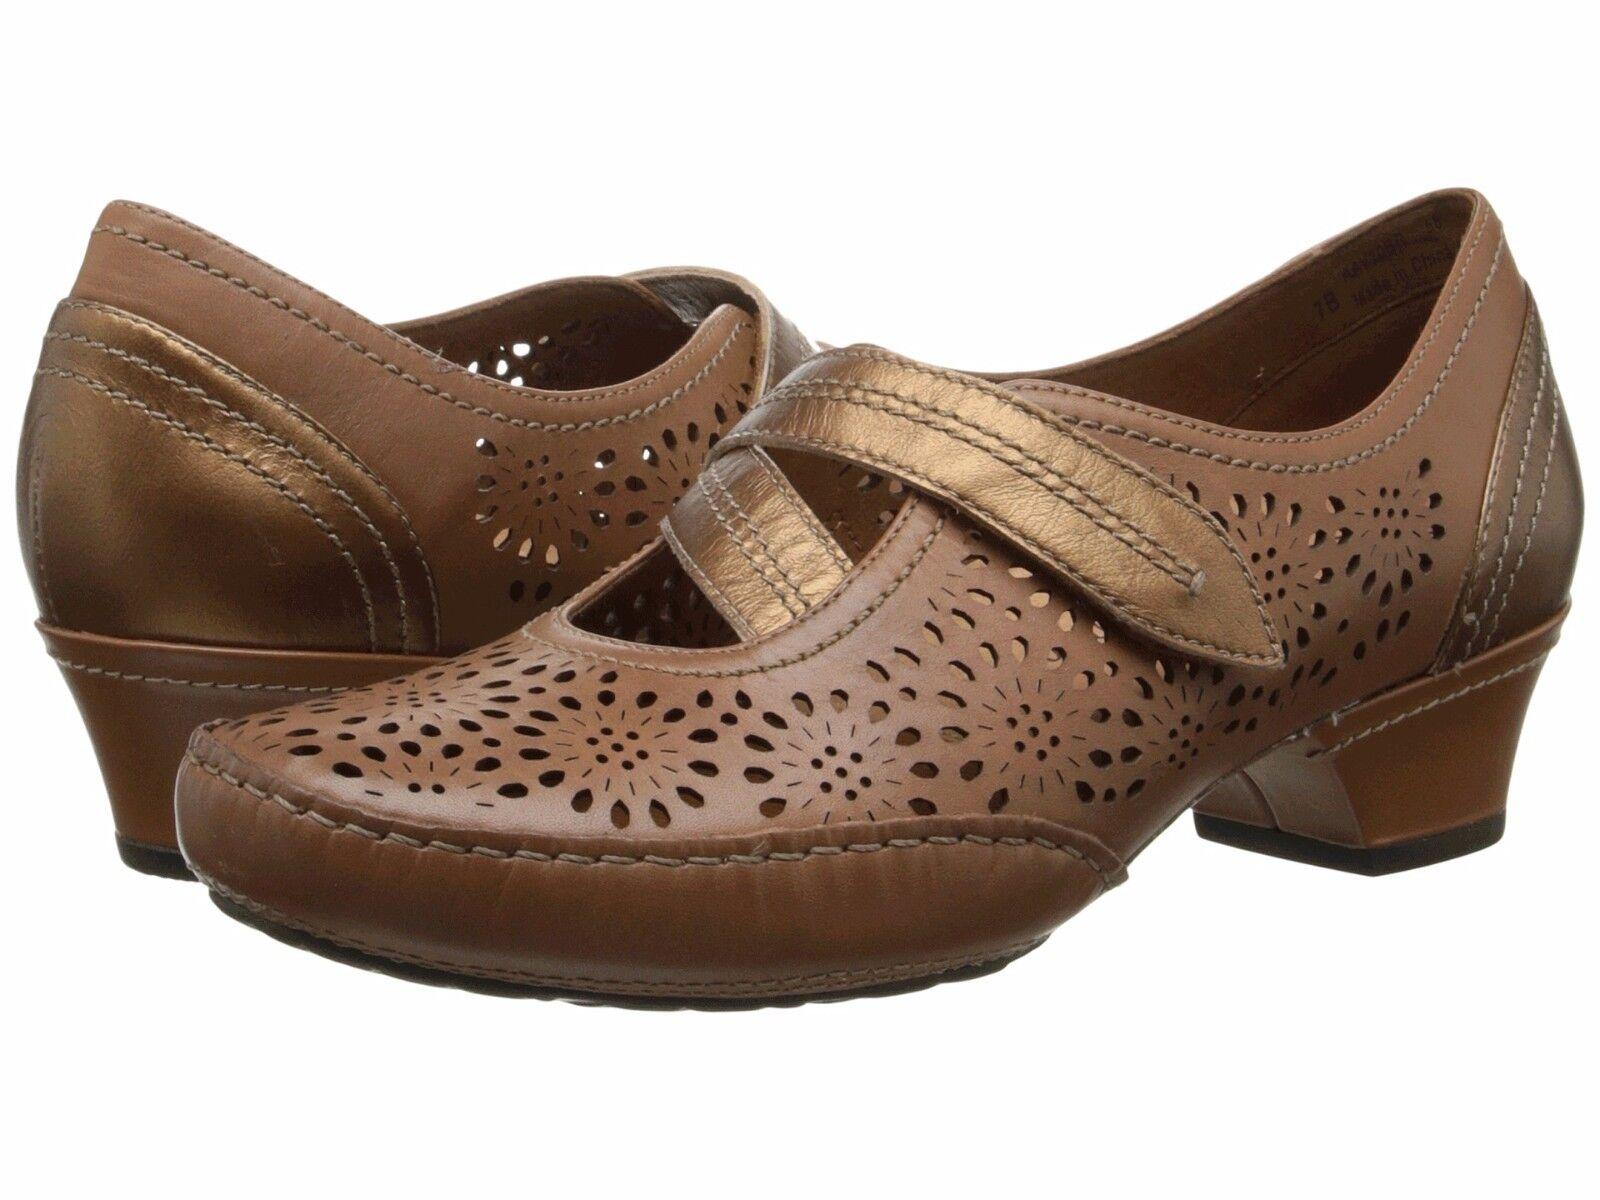 New ARAVON by  New Balance Flex-Lacey Mary Jane Pump  donna scarpe sz  US 8.5